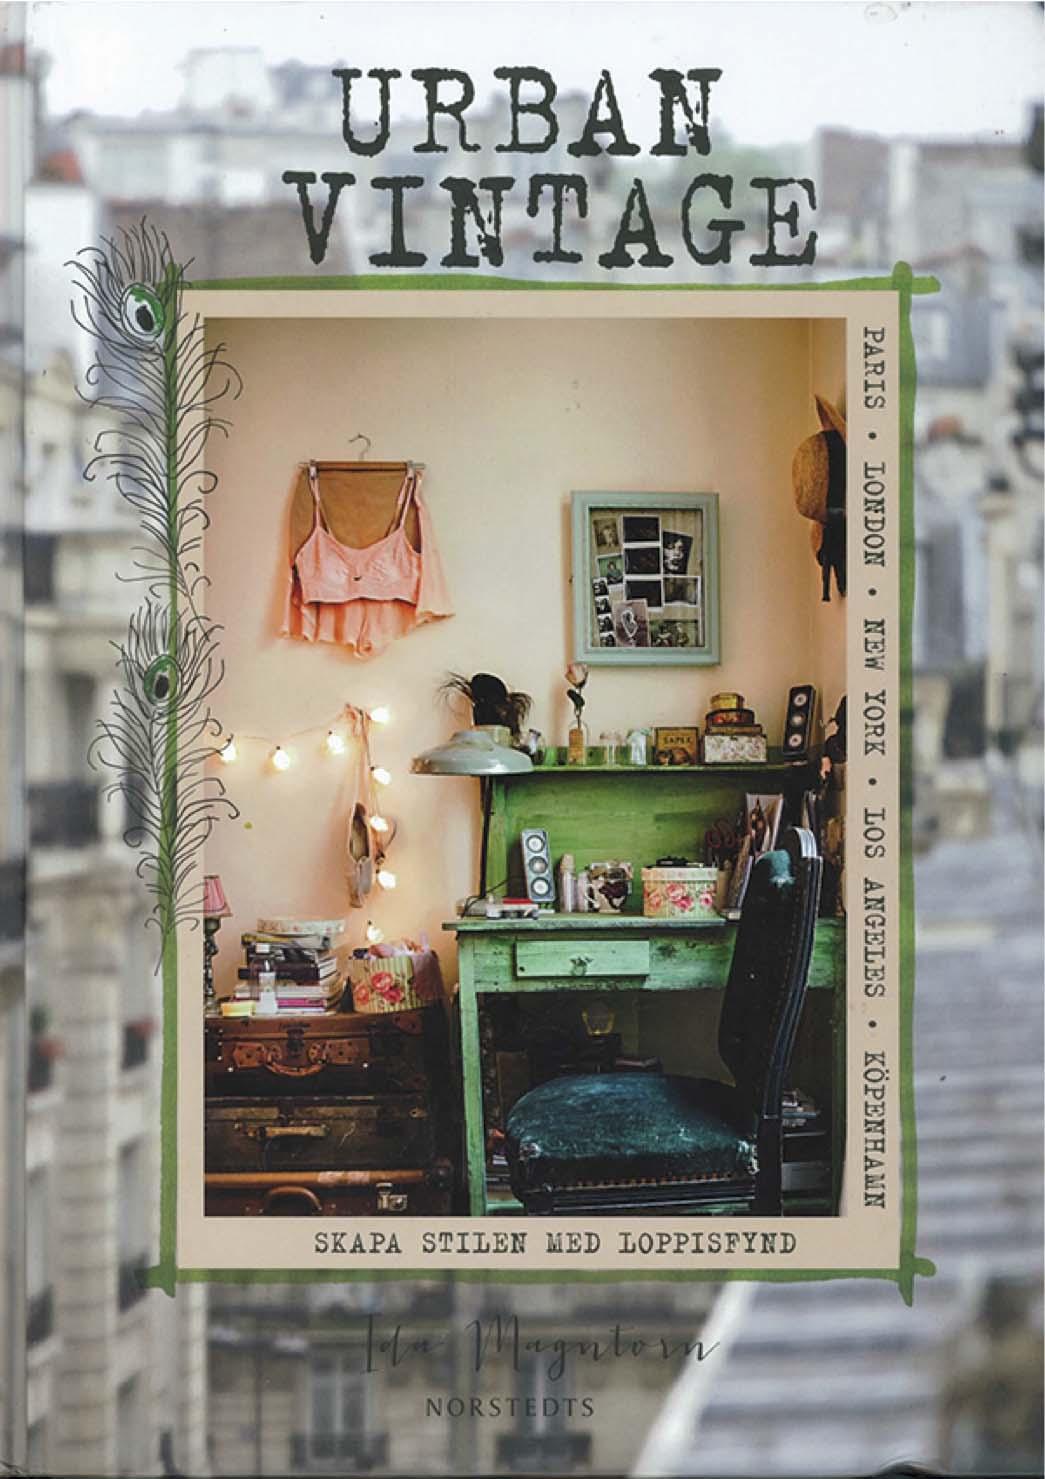 Urban Village1-cropped.jpg